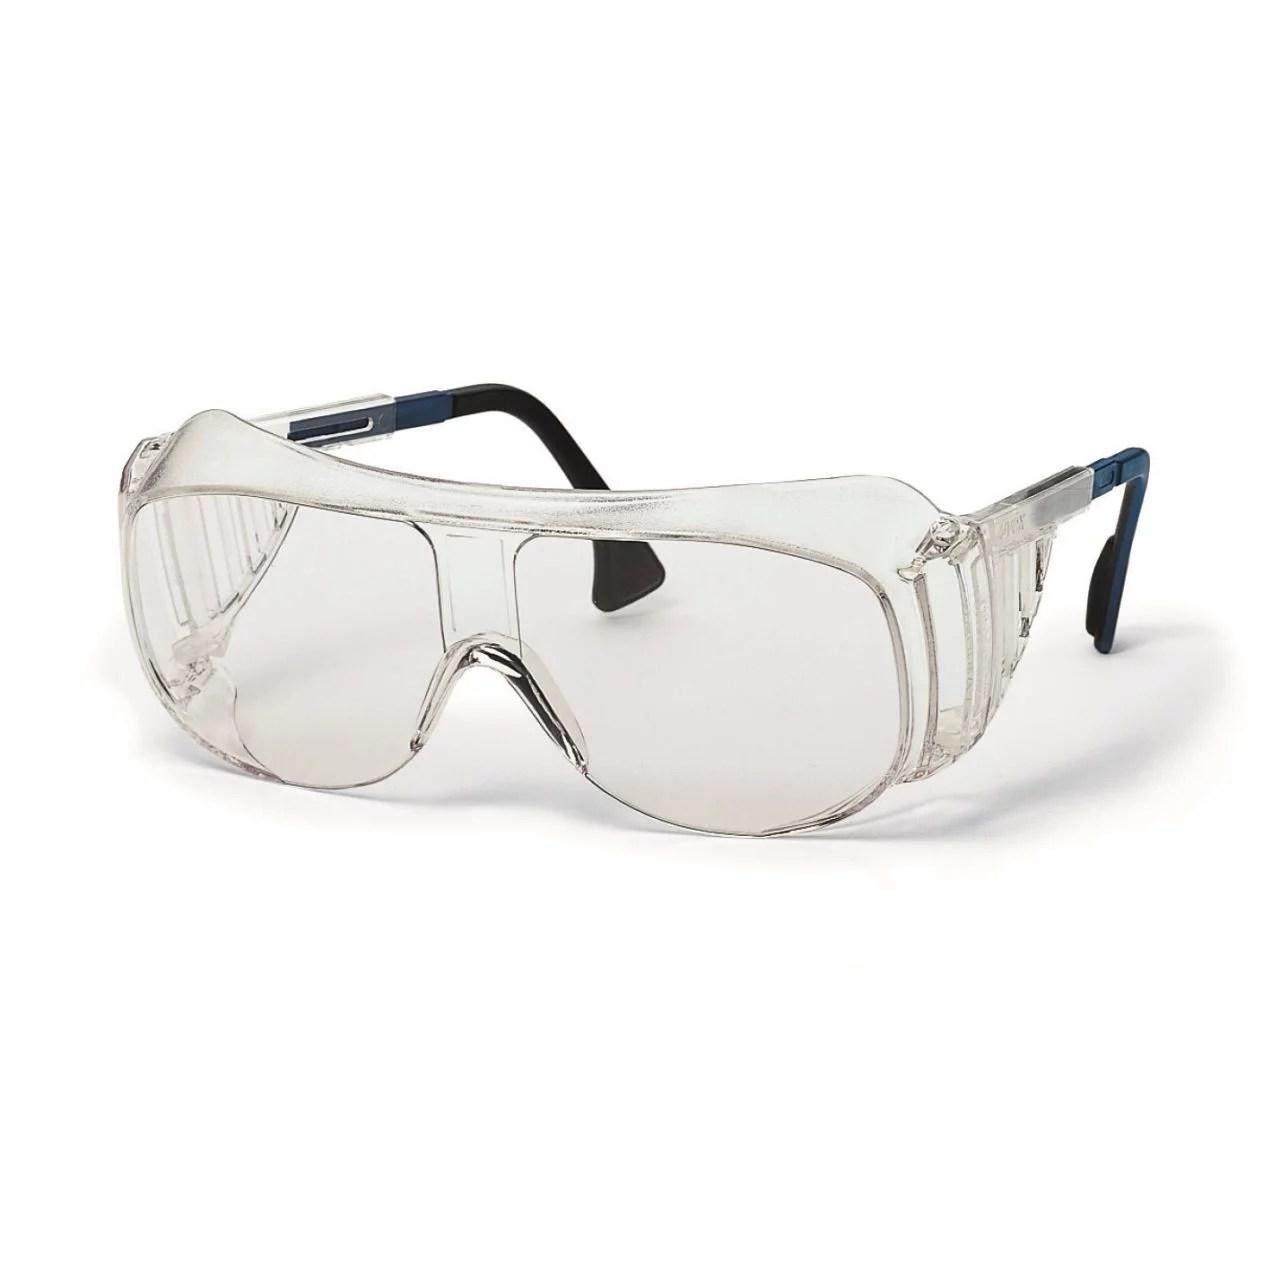 uvex 9161 safety spectacles   Safety Eyewear   uvex safety